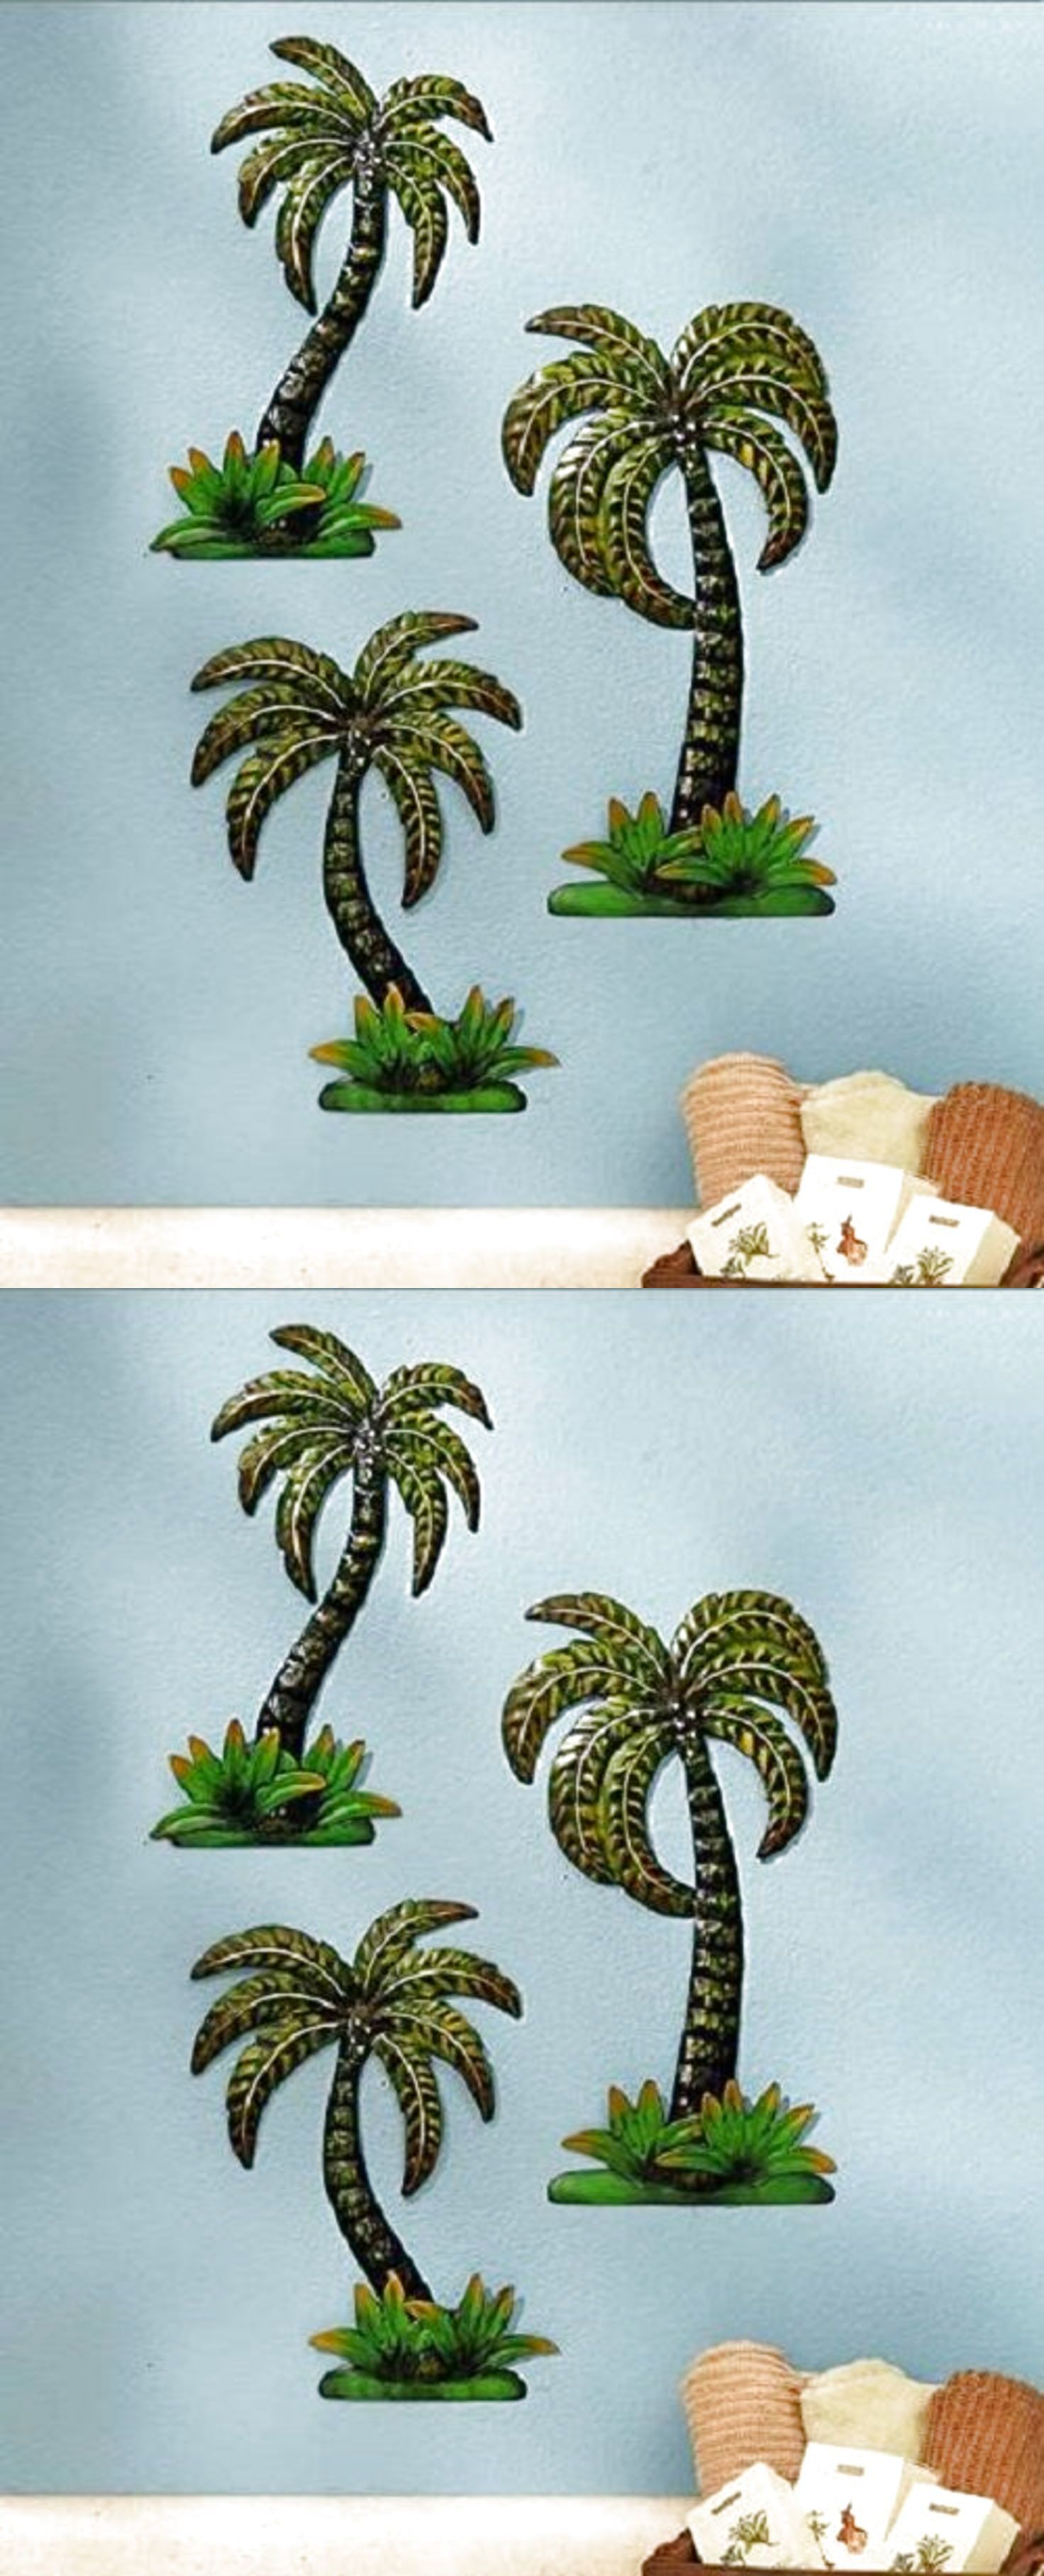 Metal wall art tree palm bathroom decor tropical living room kitchen